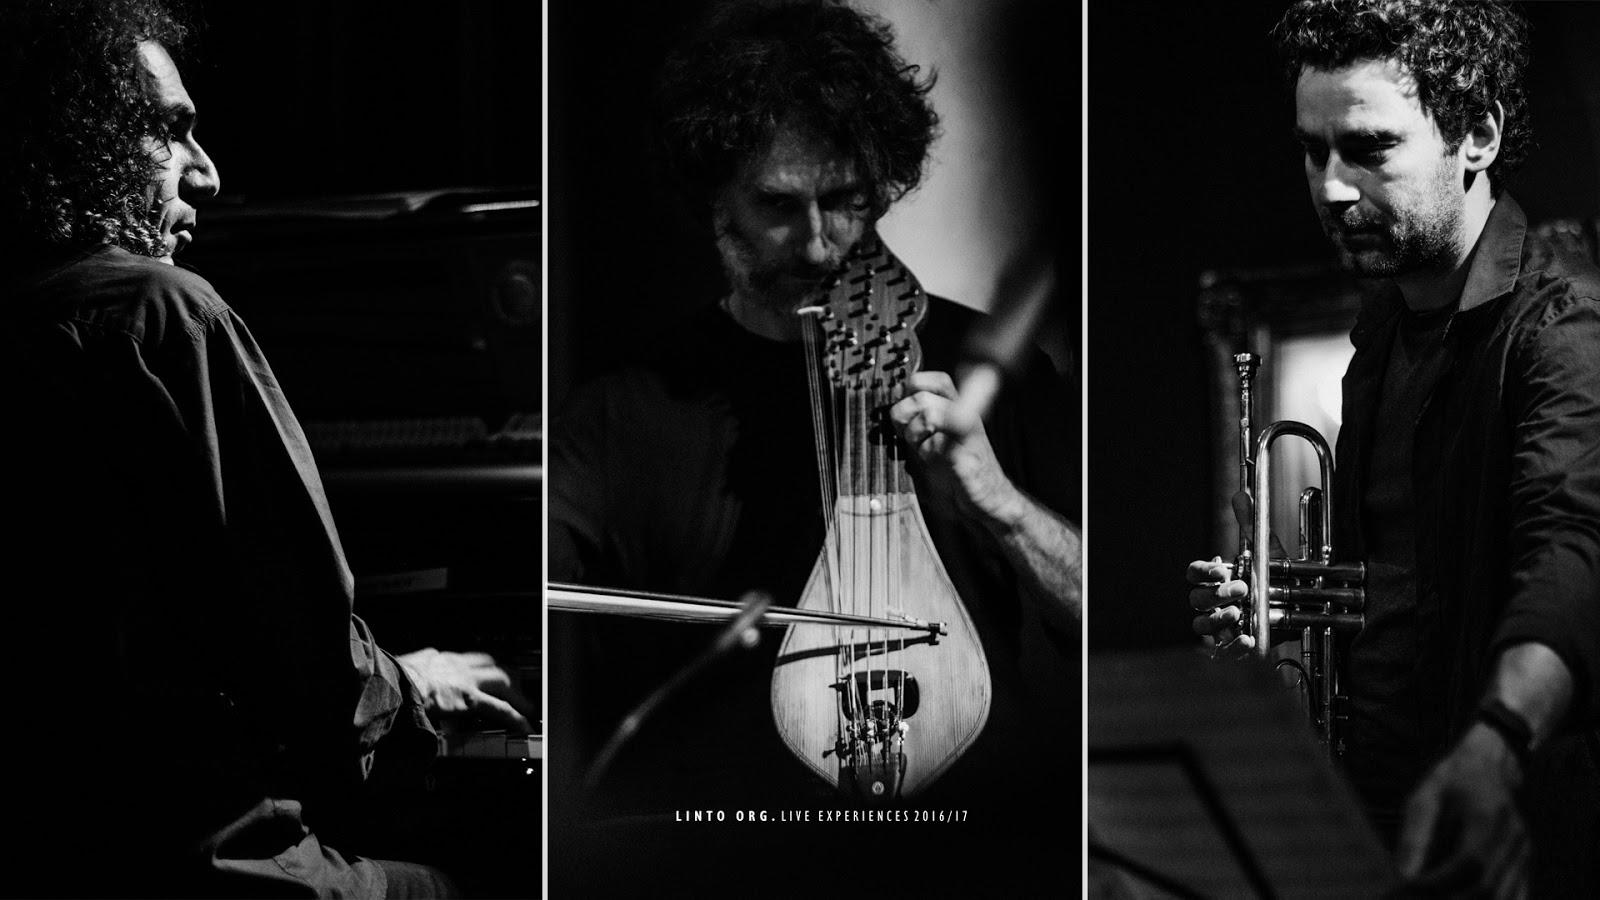 Stavros Lantsias Trio at Linto